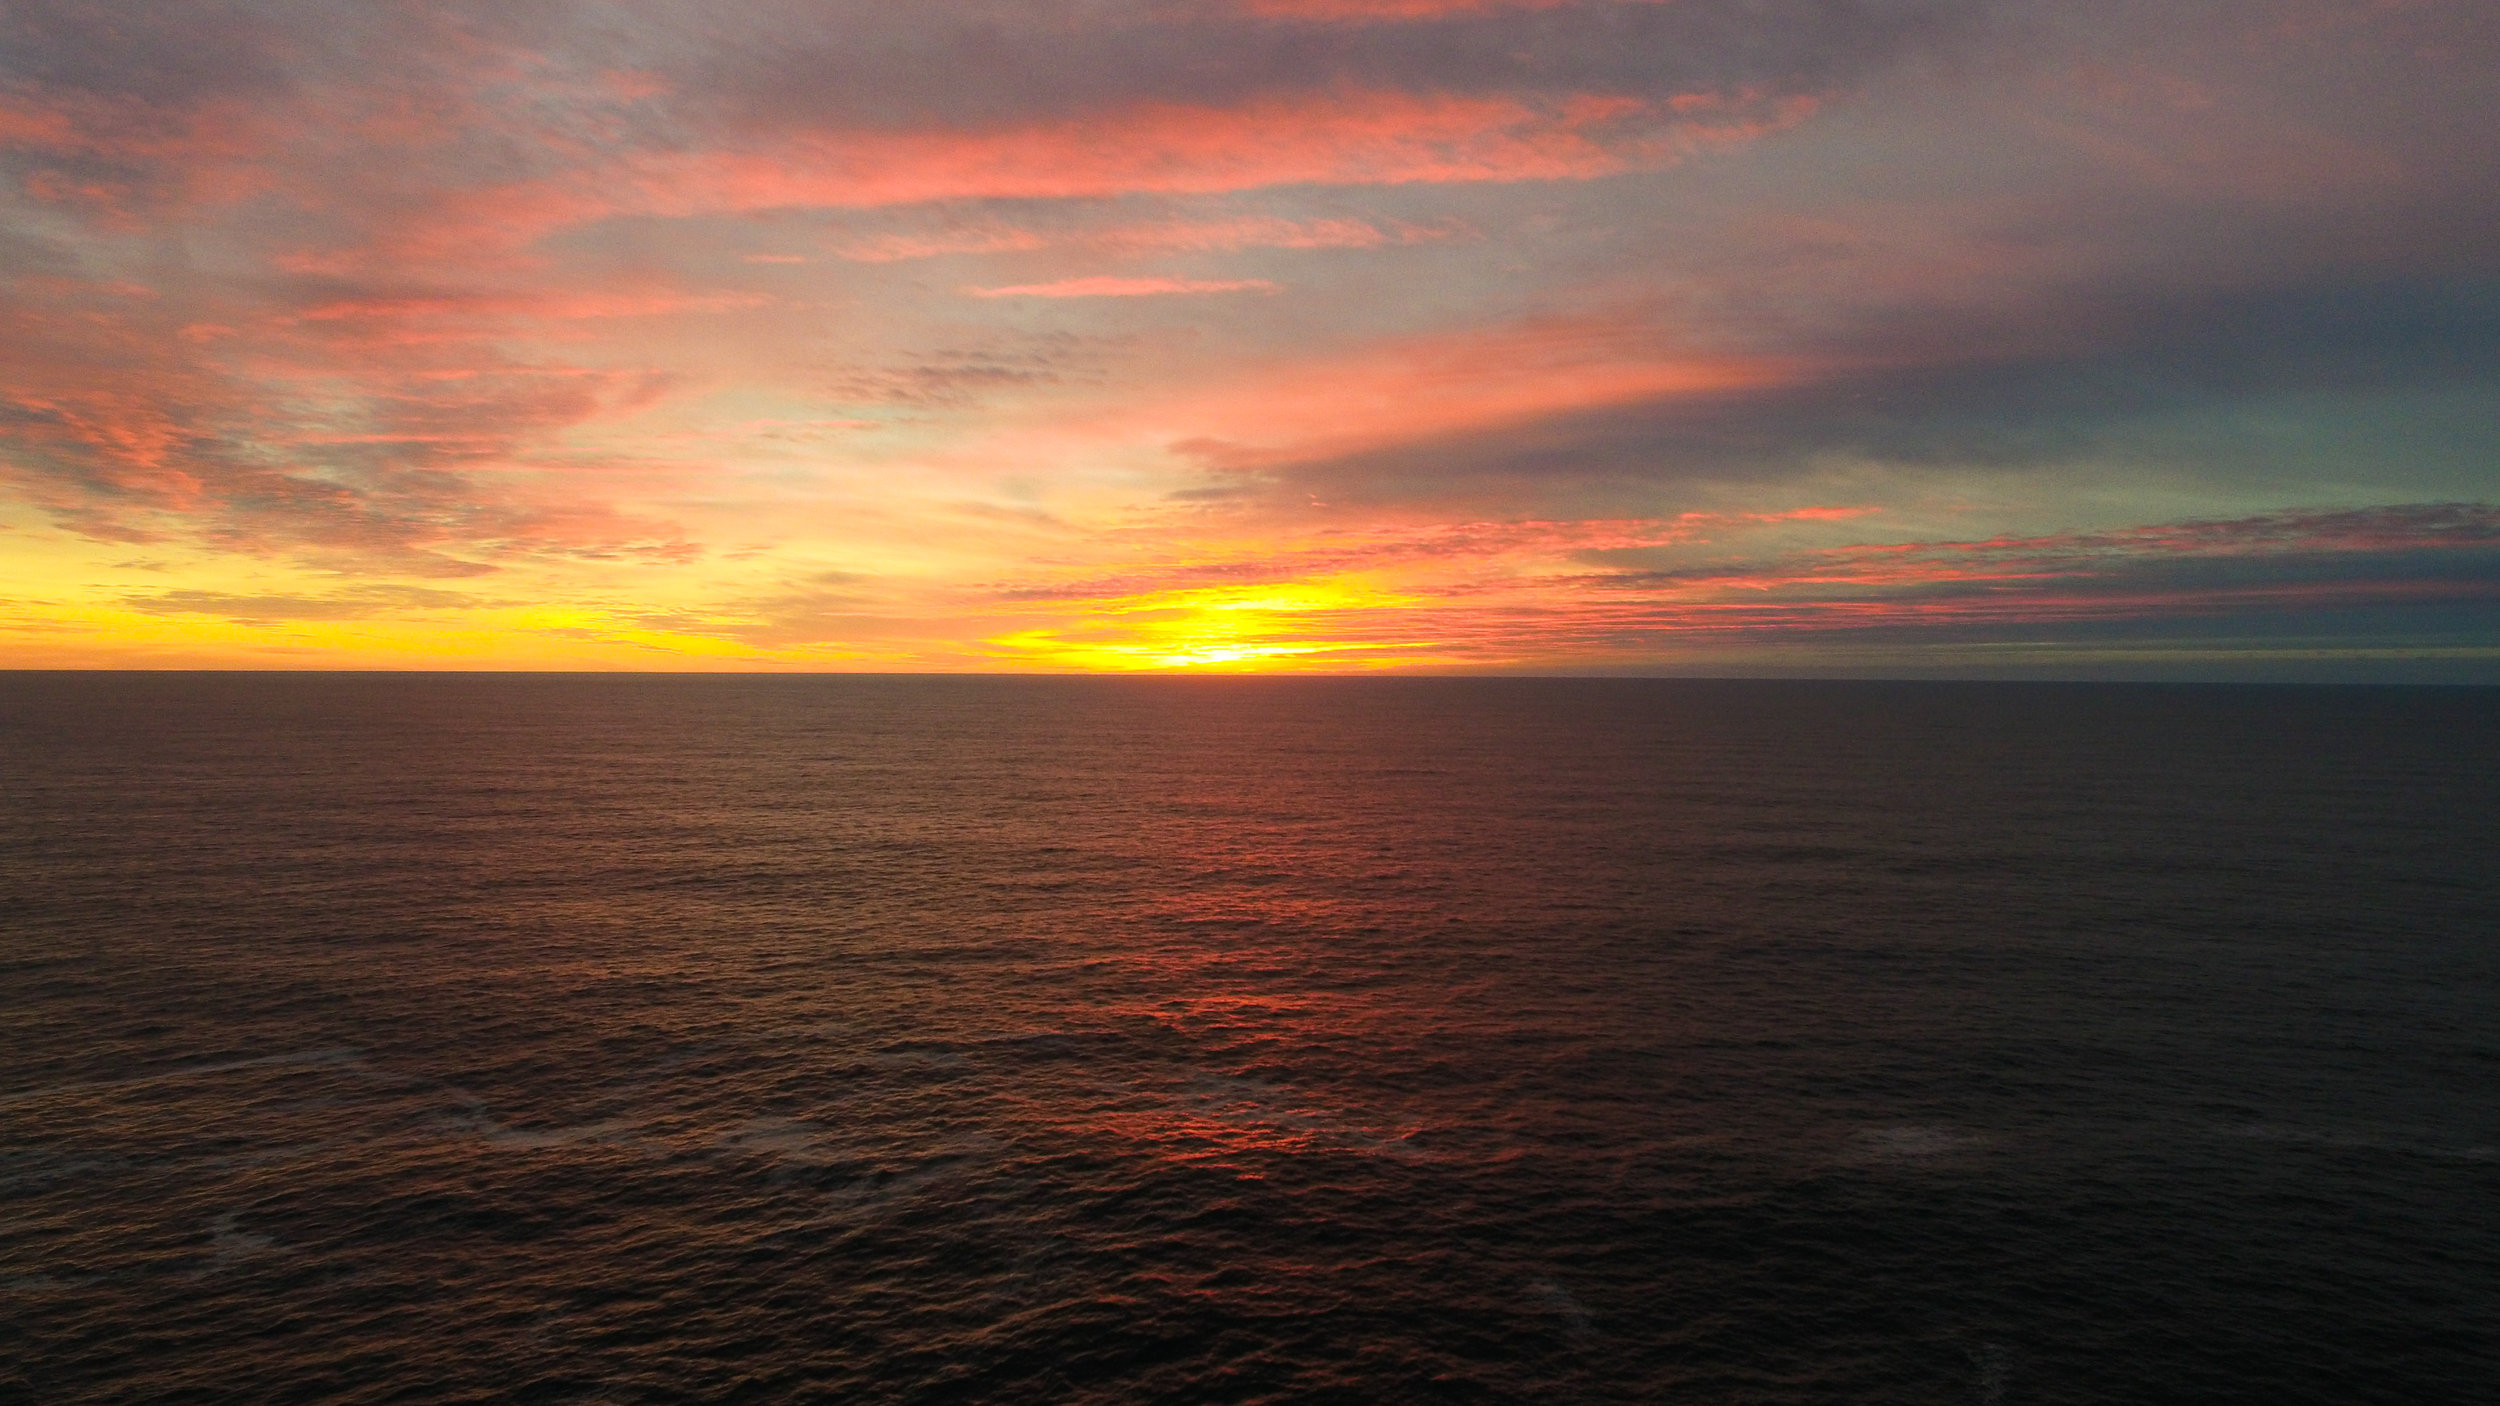 Nothing Better than Coastal Sunsets